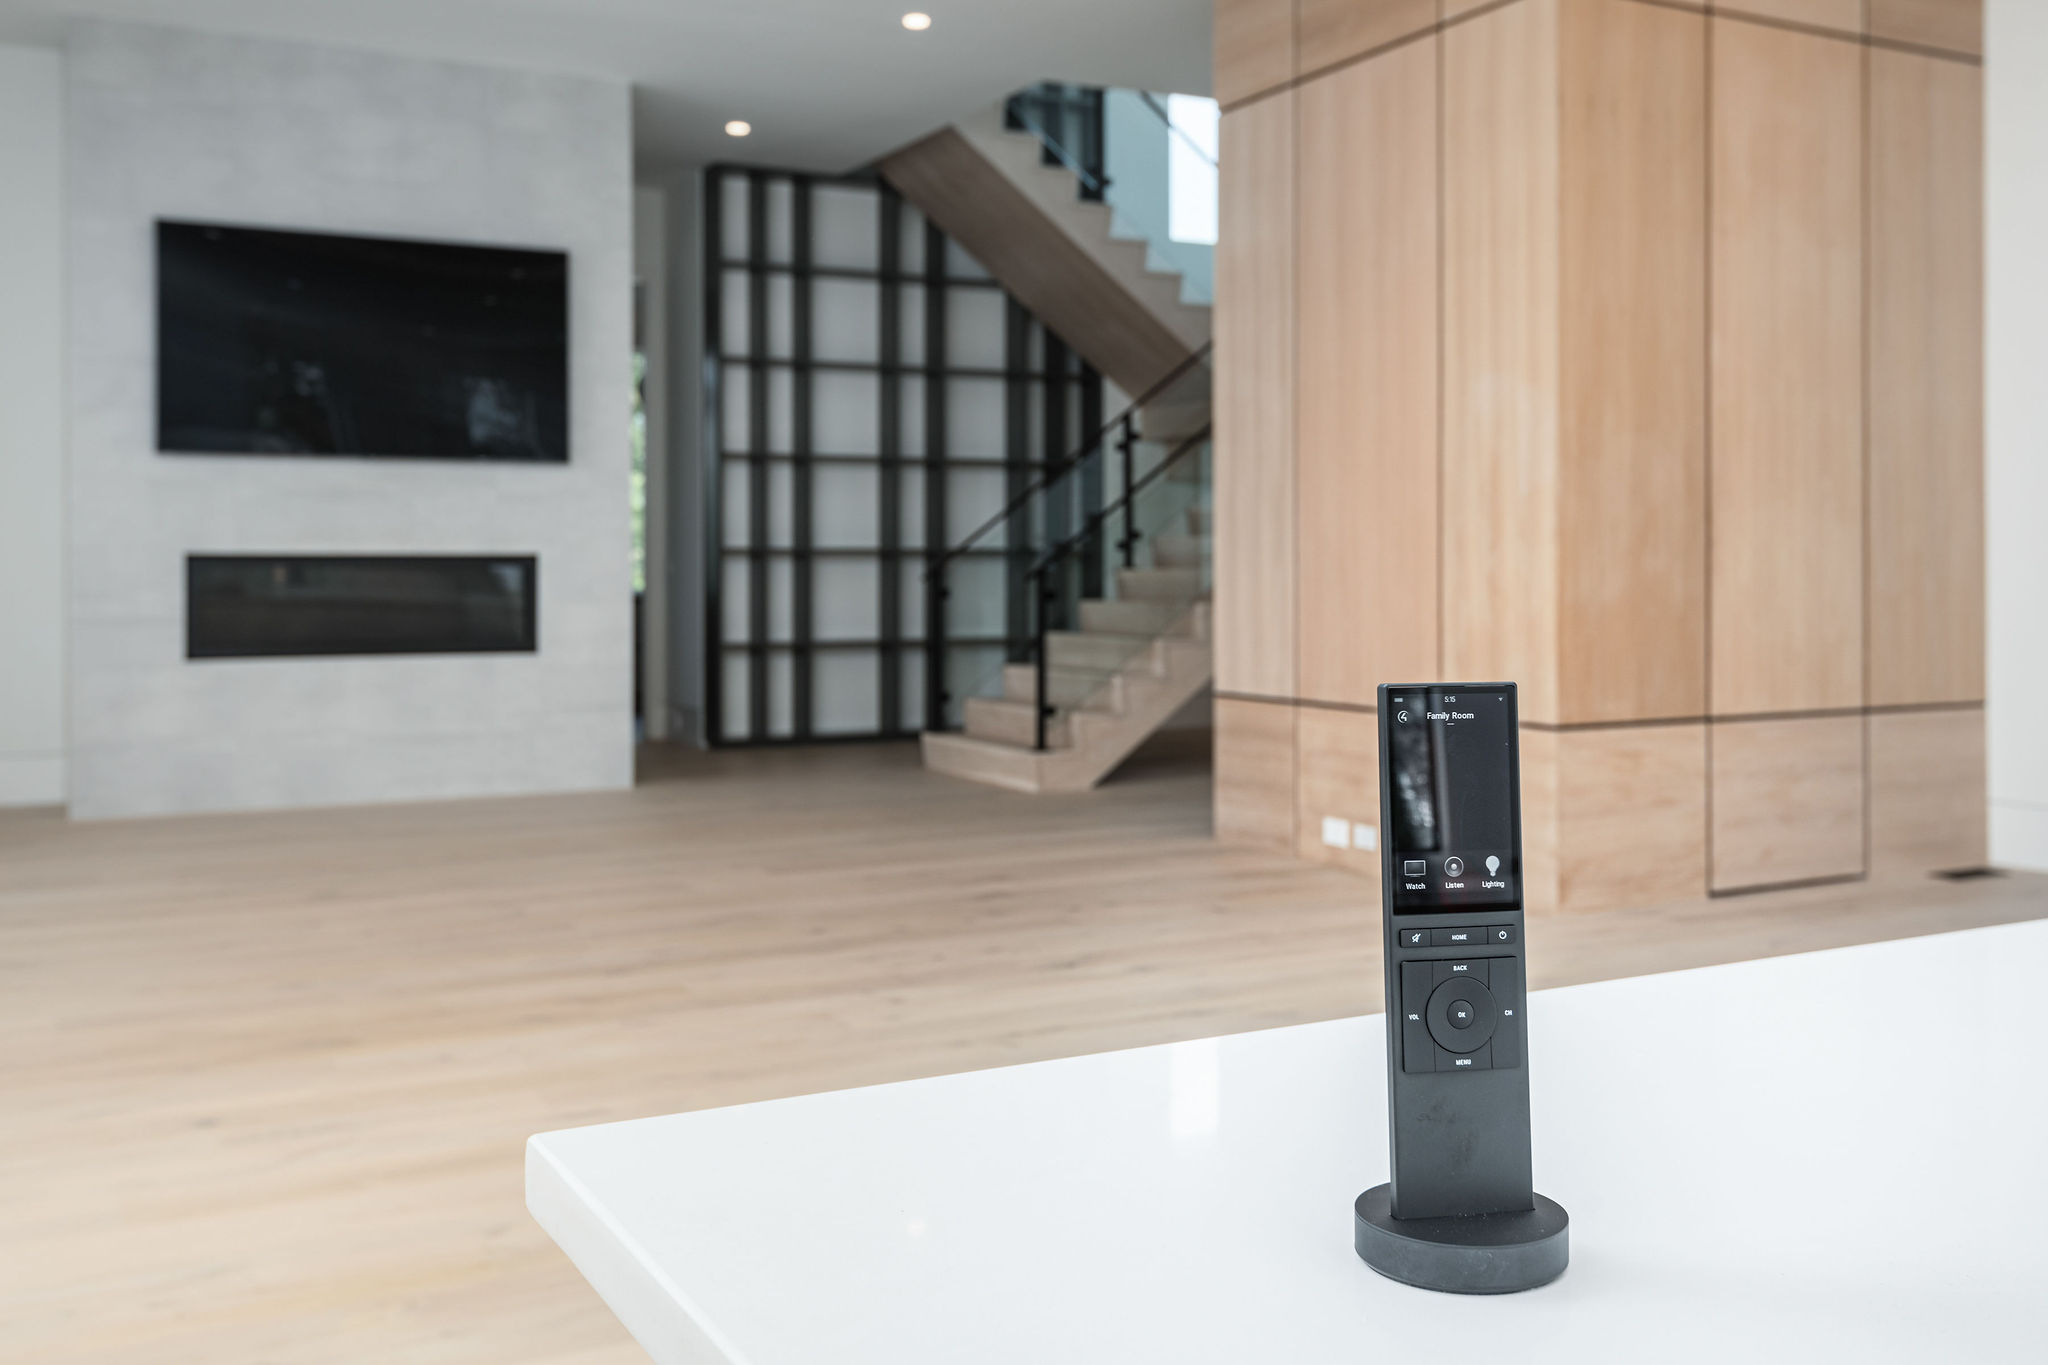 Charleston Smart Home Control4